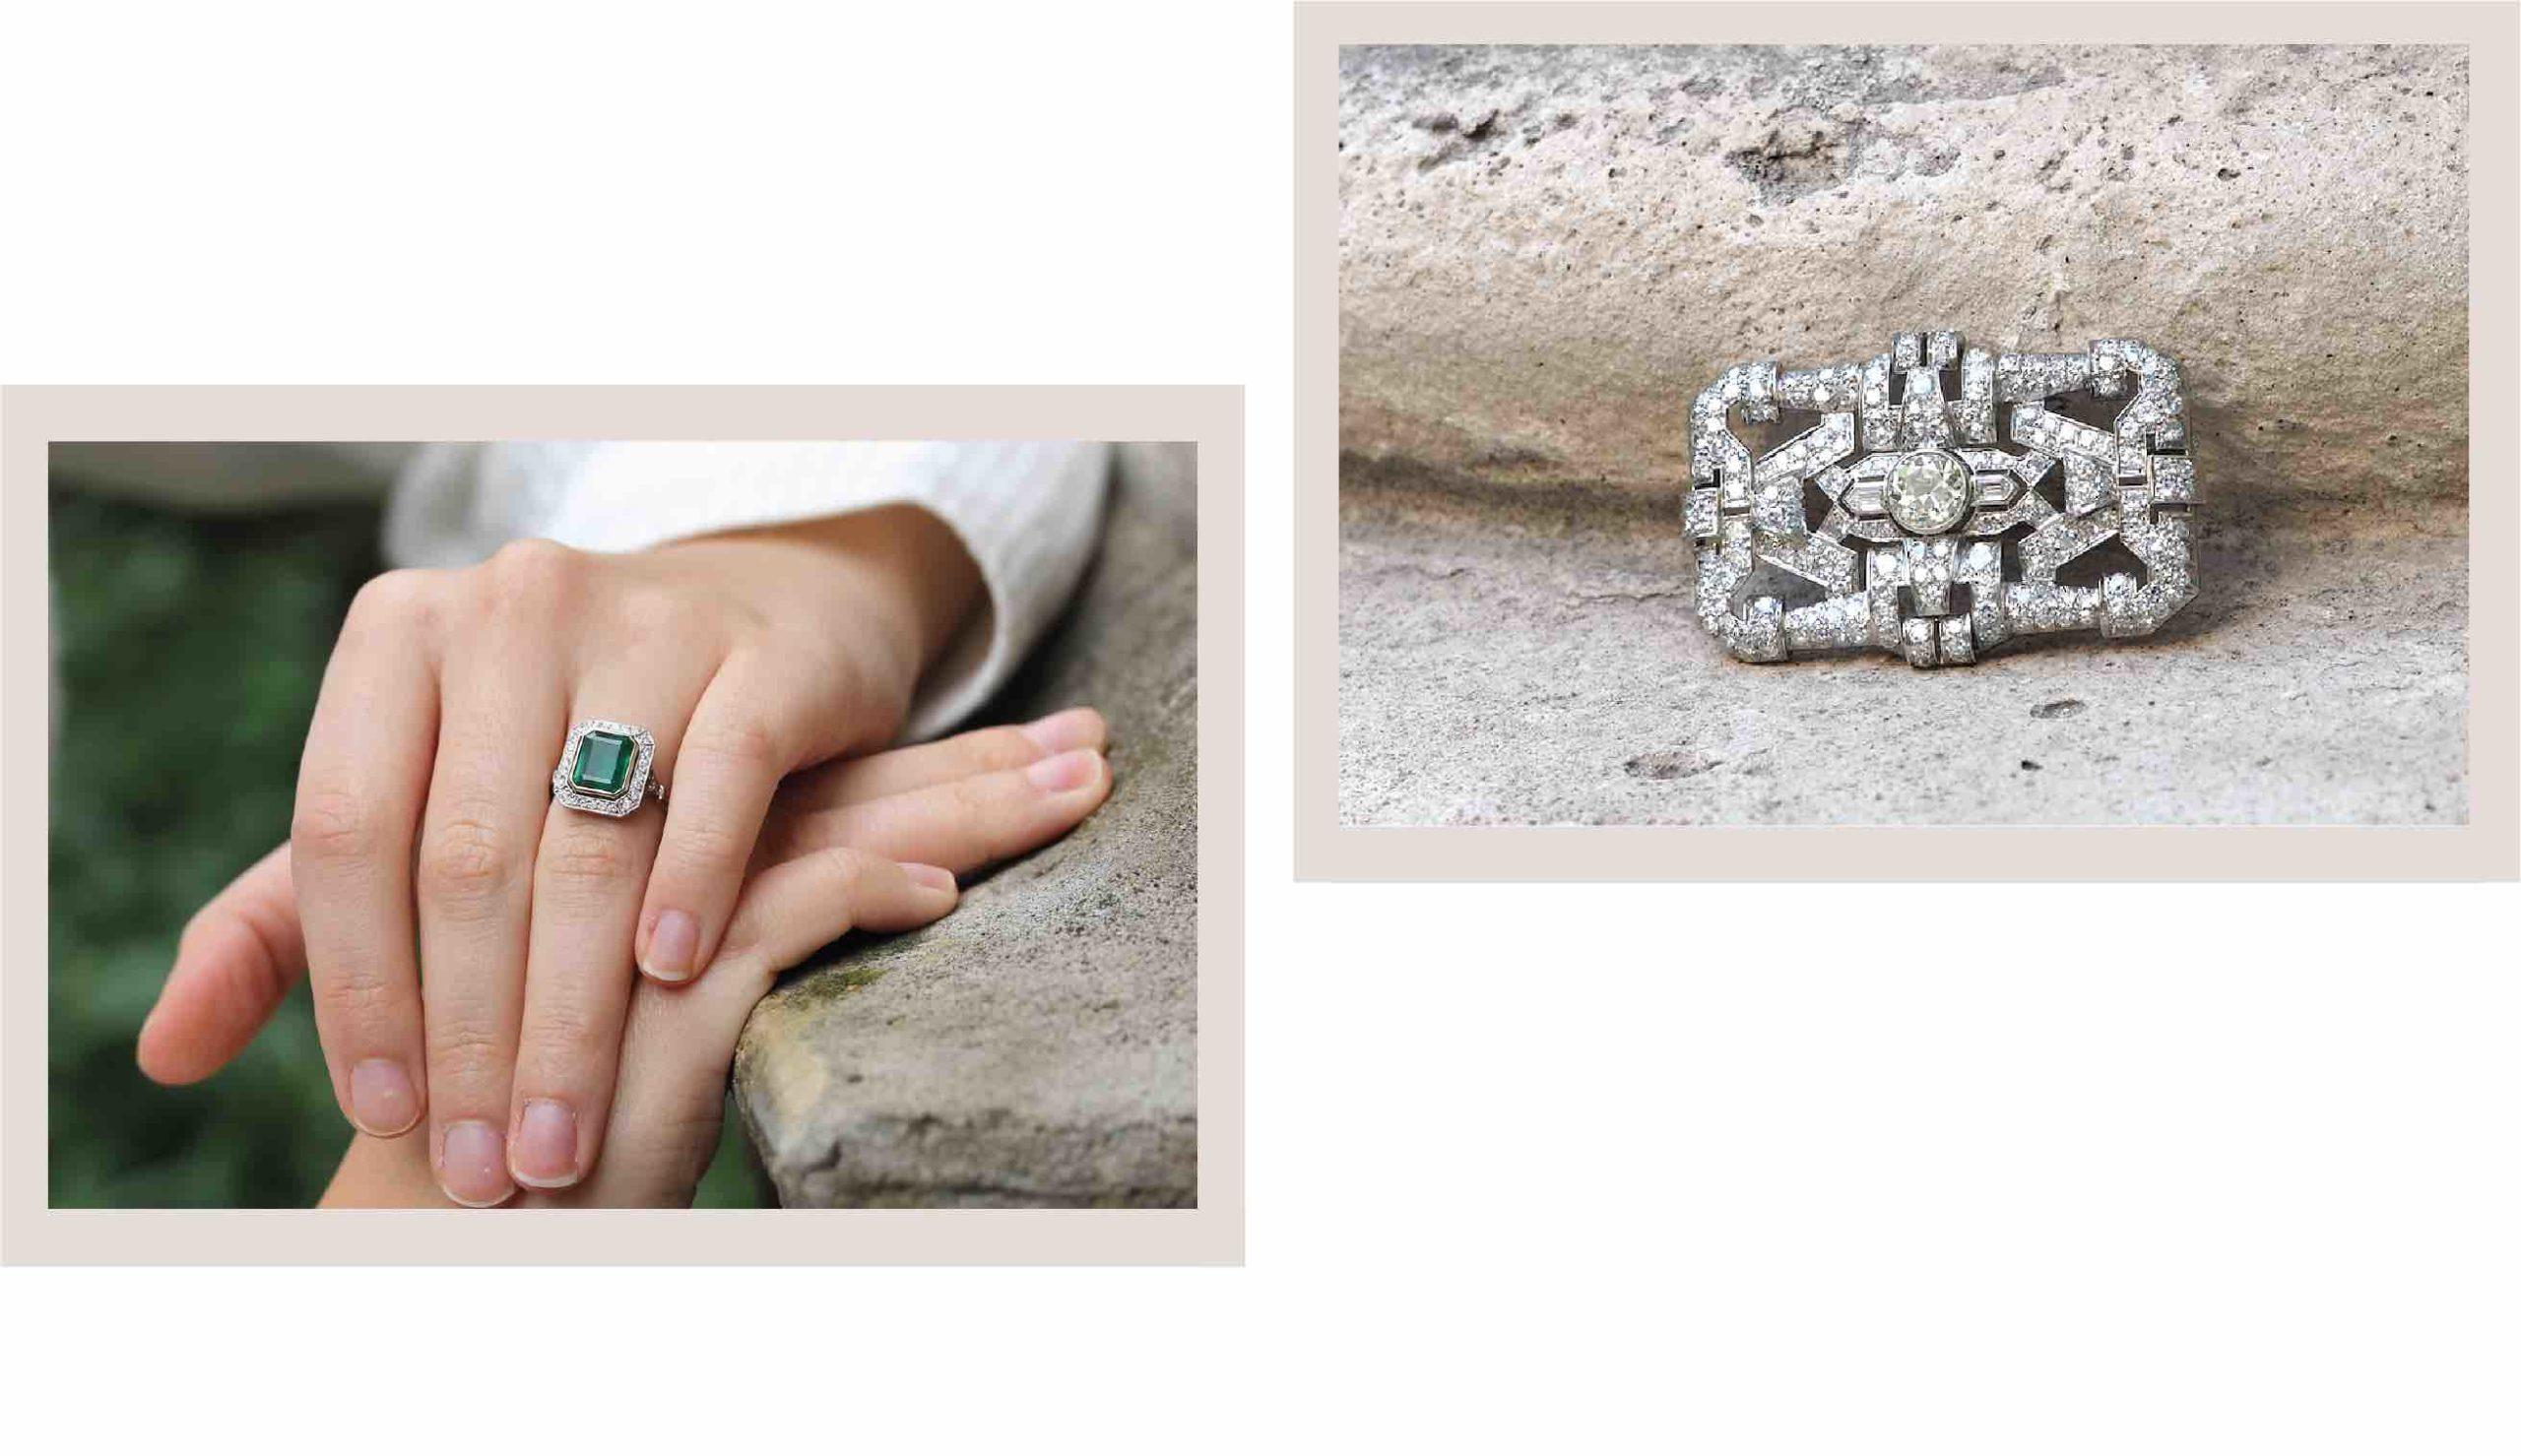 rachat de bijoux anciens art déco